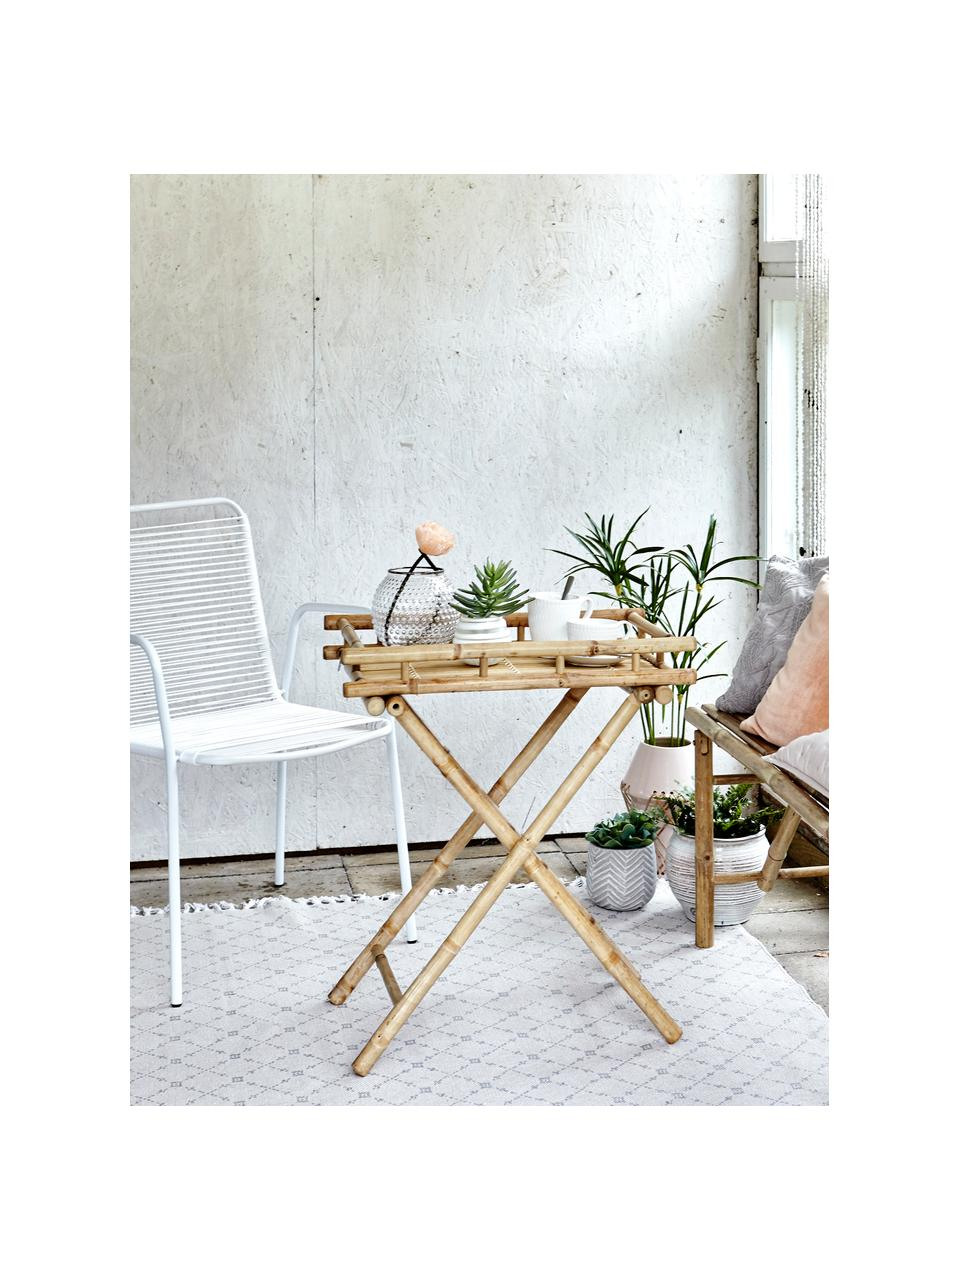 Klappbarer Garten-Beistelltisch Mandisa aus Bambus, Bambus, naturbelassen, Bambus, 60 x 68 cm